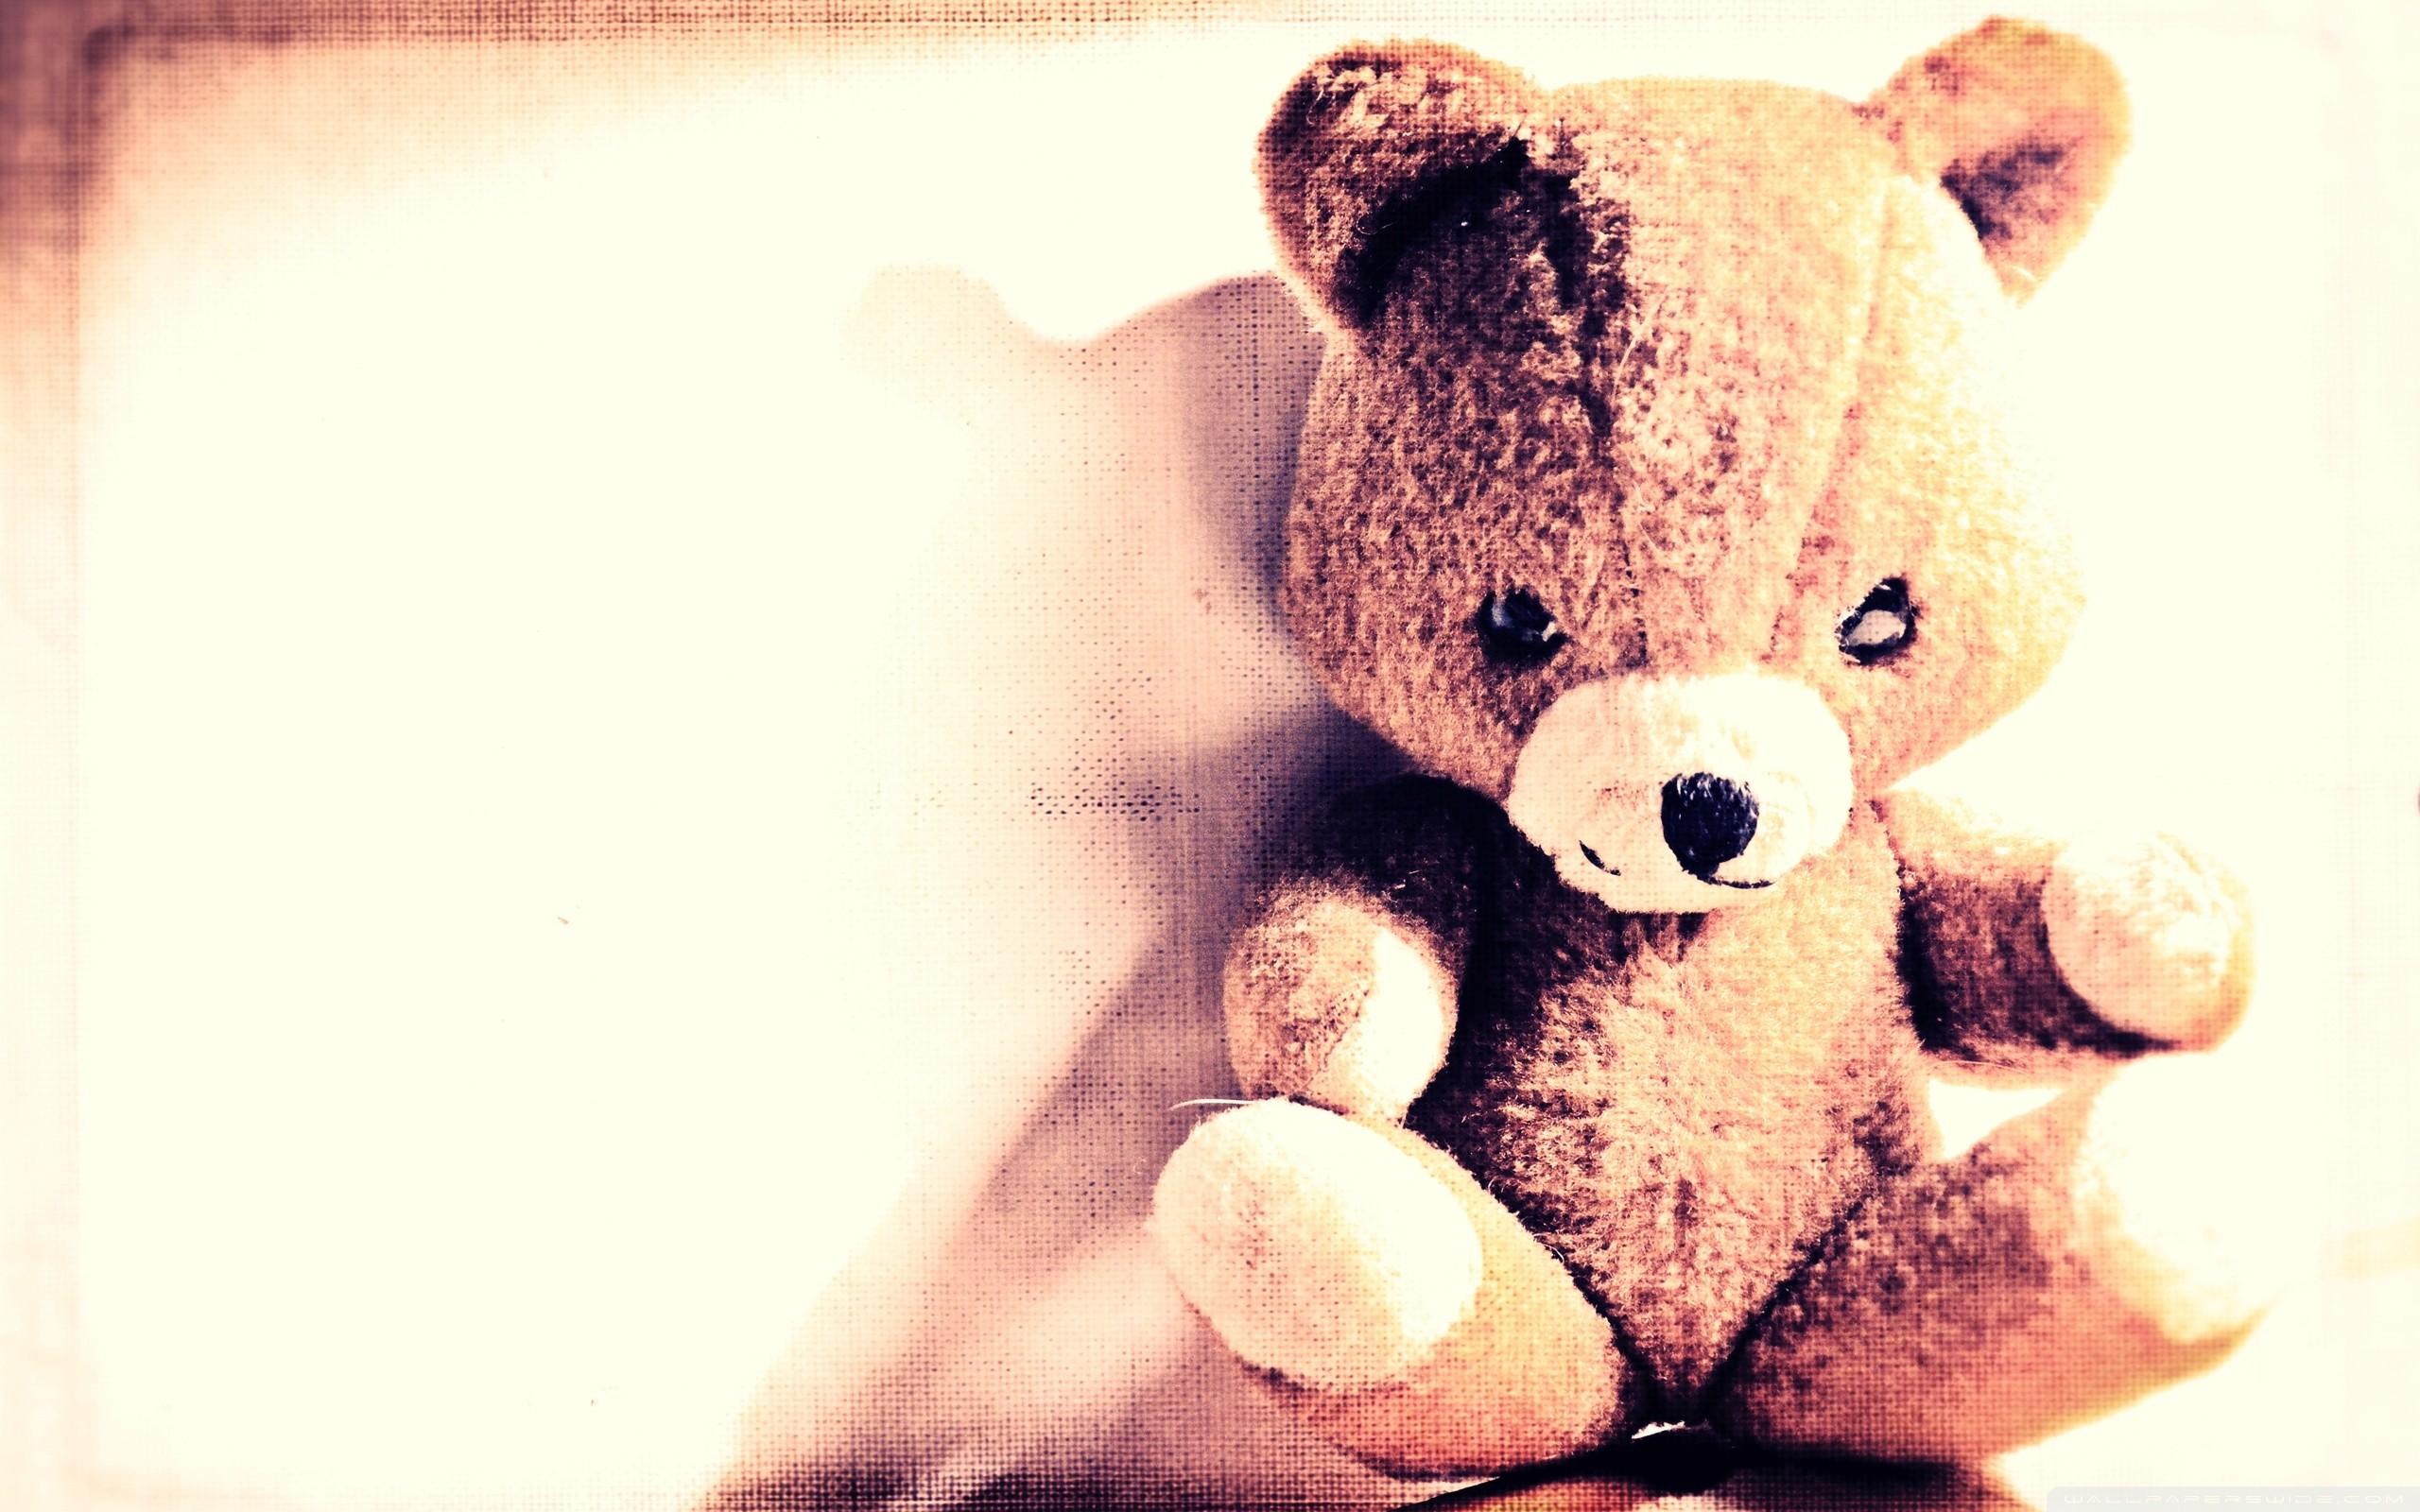 Bunny Cute Pink Teddy Bear Hd Wallpapers For Desktop: Cute Teddy Bears Wallpapers (59+ Images